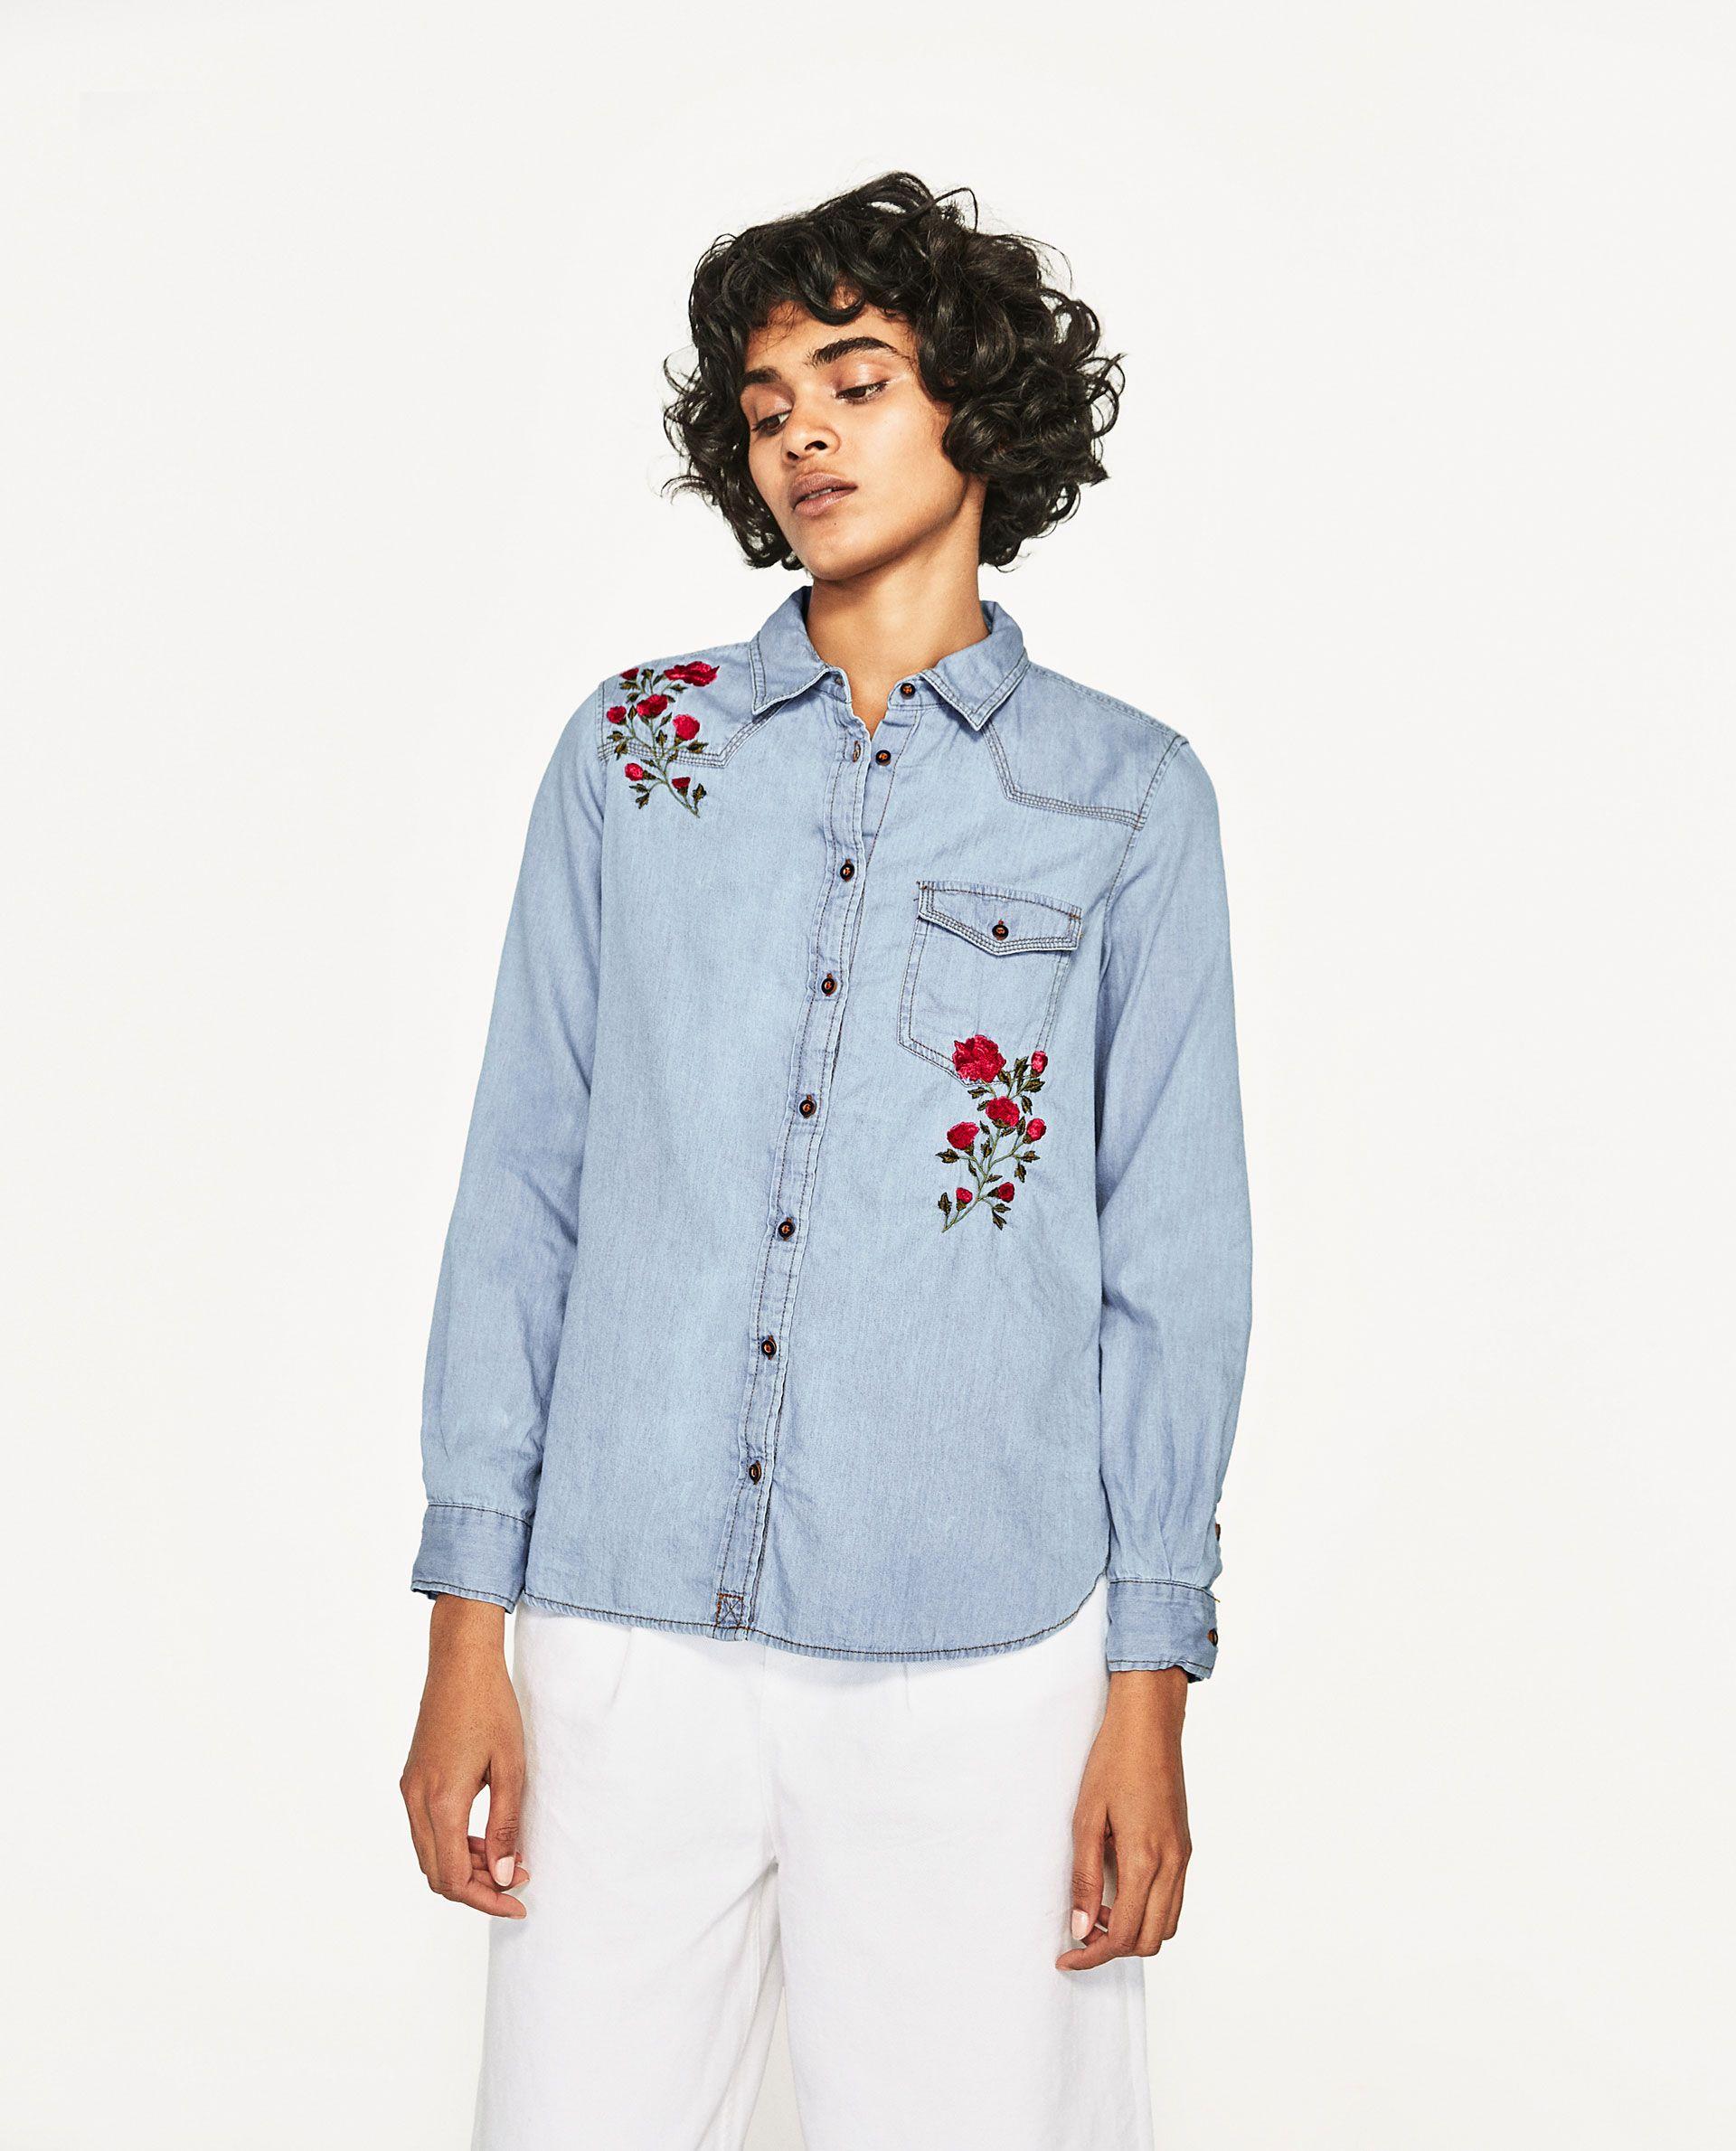 d41b0575 ZARA FLORAL EMBROIDERY DENIM SHIRT | BORDADO | Shirt embroidery ...